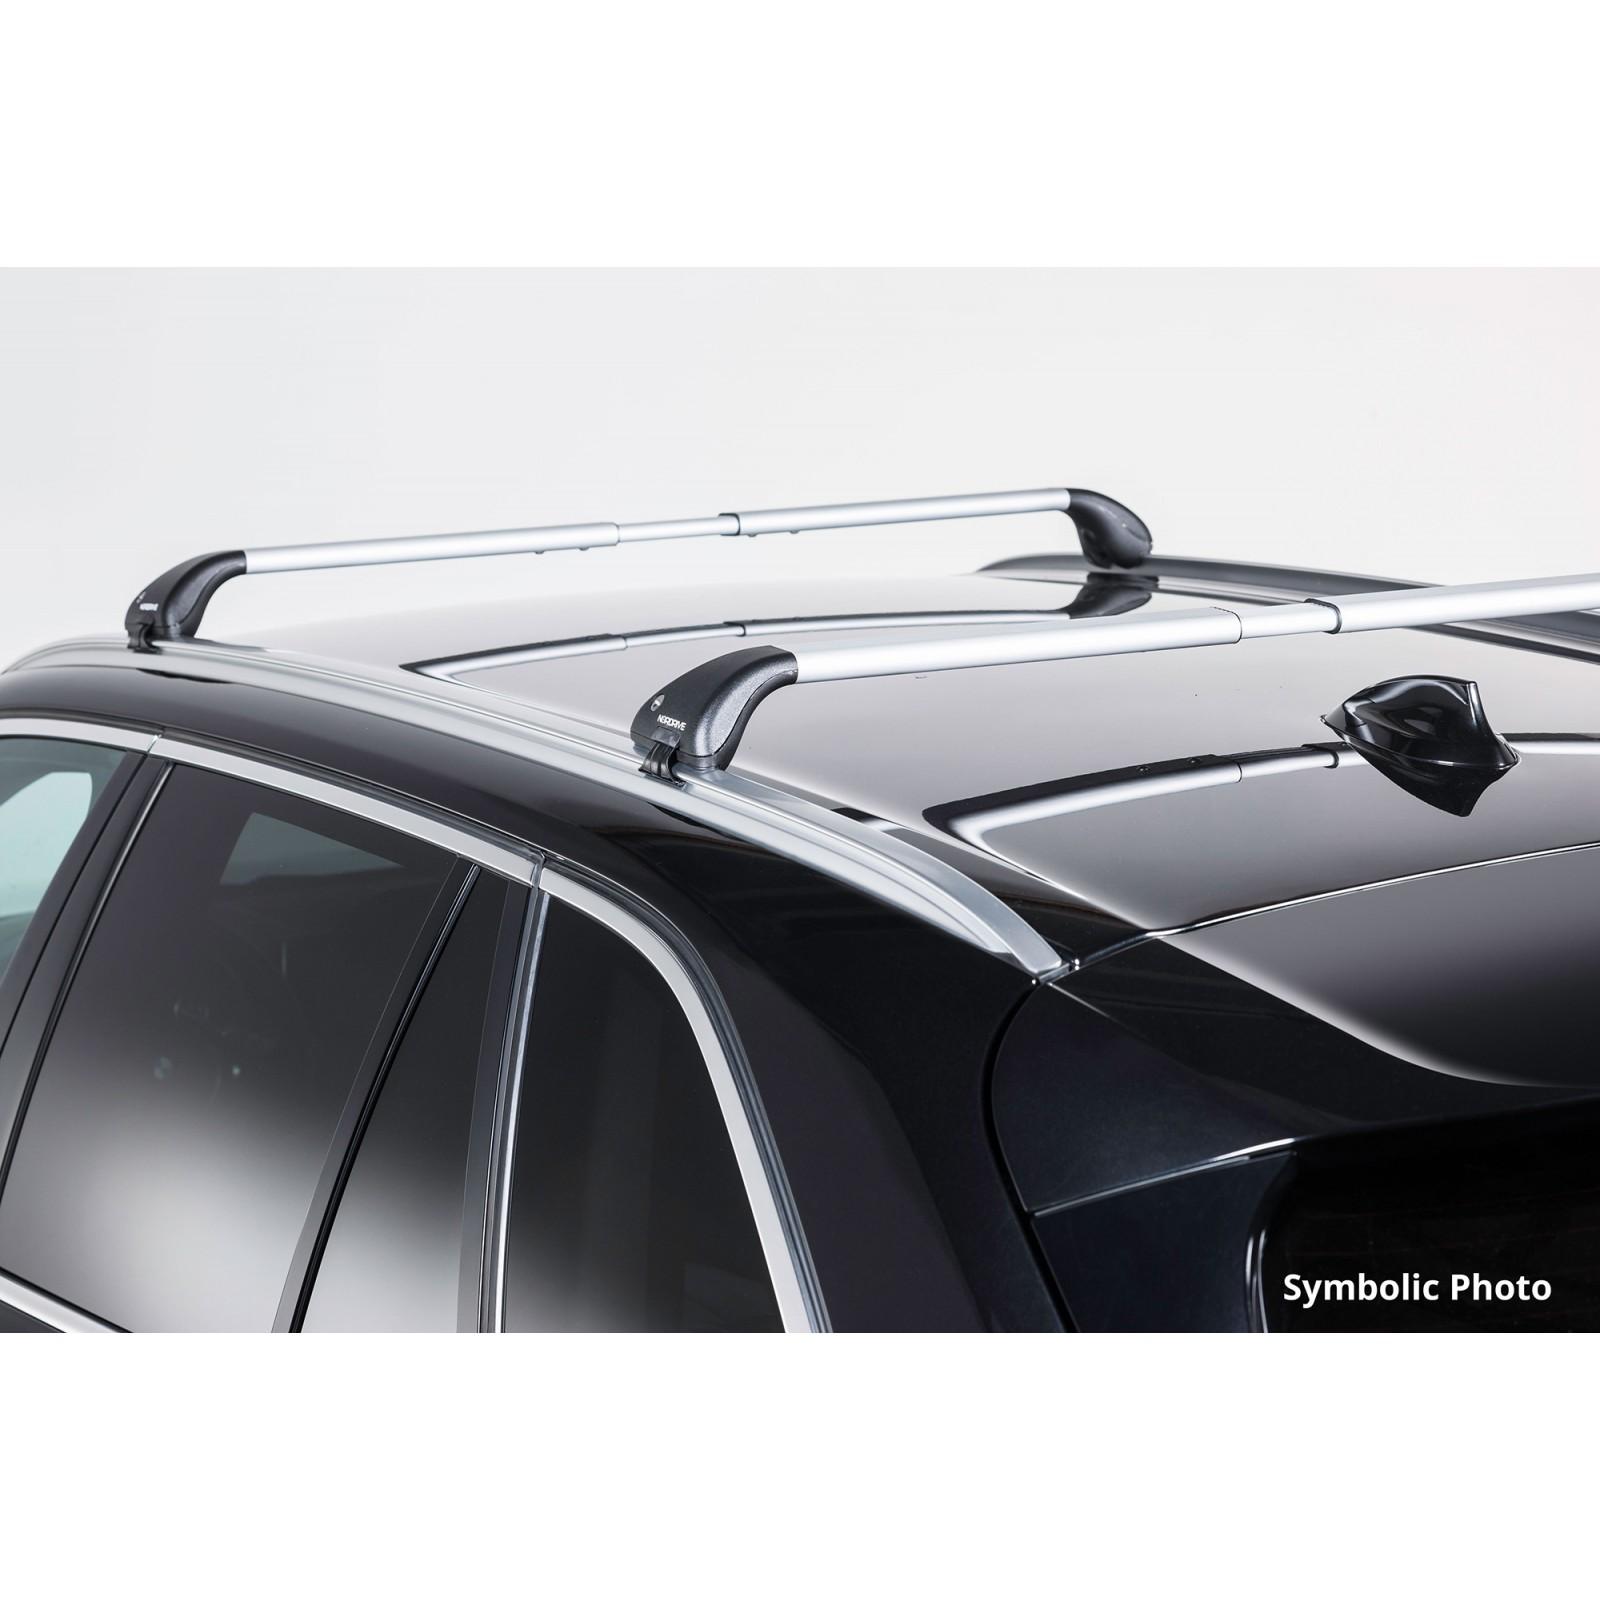 barres de toit en aluminium pour toyota rav4. Black Bedroom Furniture Sets. Home Design Ideas